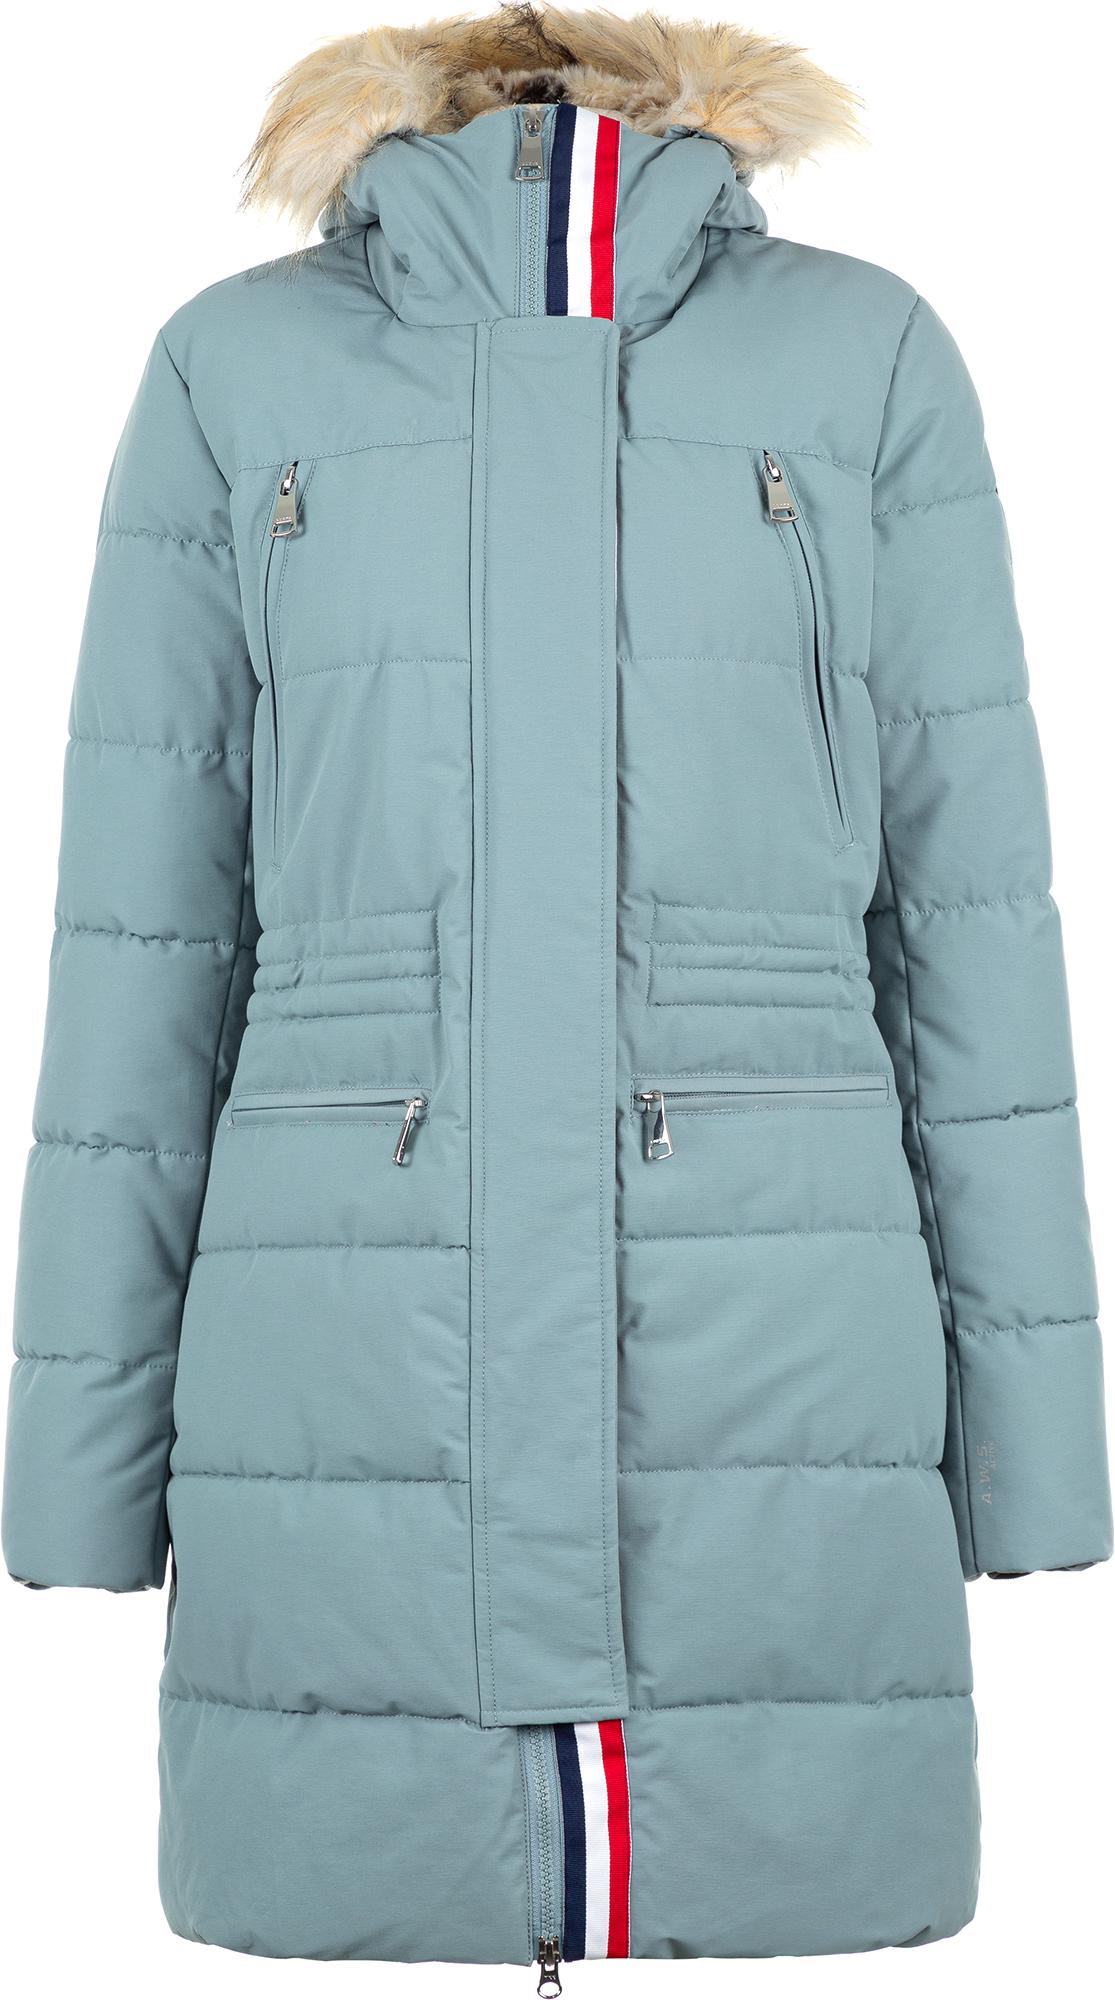 Luhta Куртка утепленная женская Luhta Inginmaa, размер 52 luhta куртка утепленная женская luhta petre размер 52